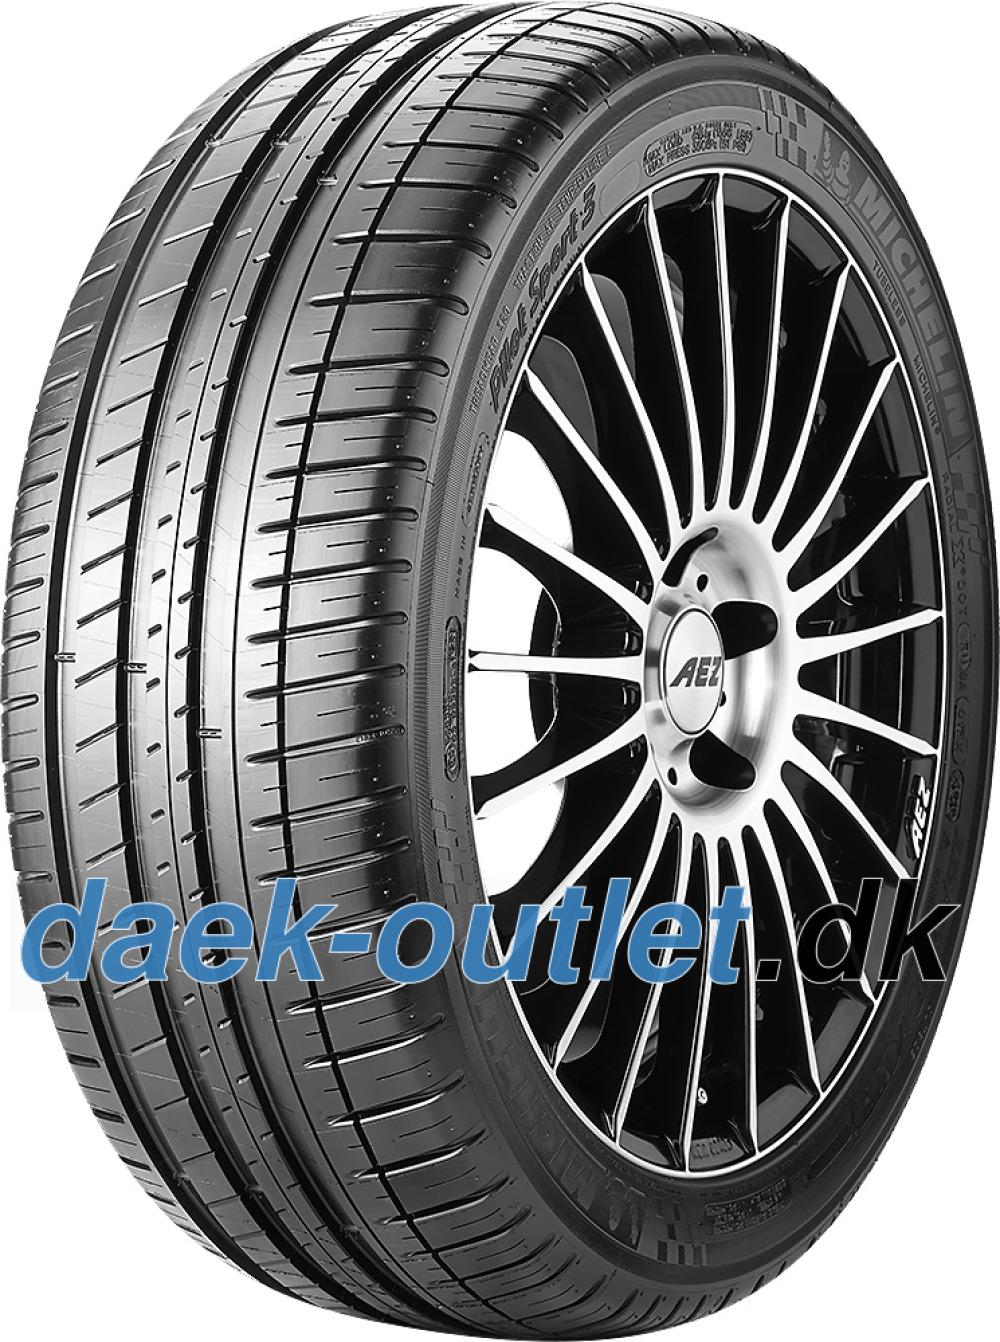 Michelin Pilot Sport 3 ( 225/45 R18 91W med fælgbeskyttelses liste (FSL) )